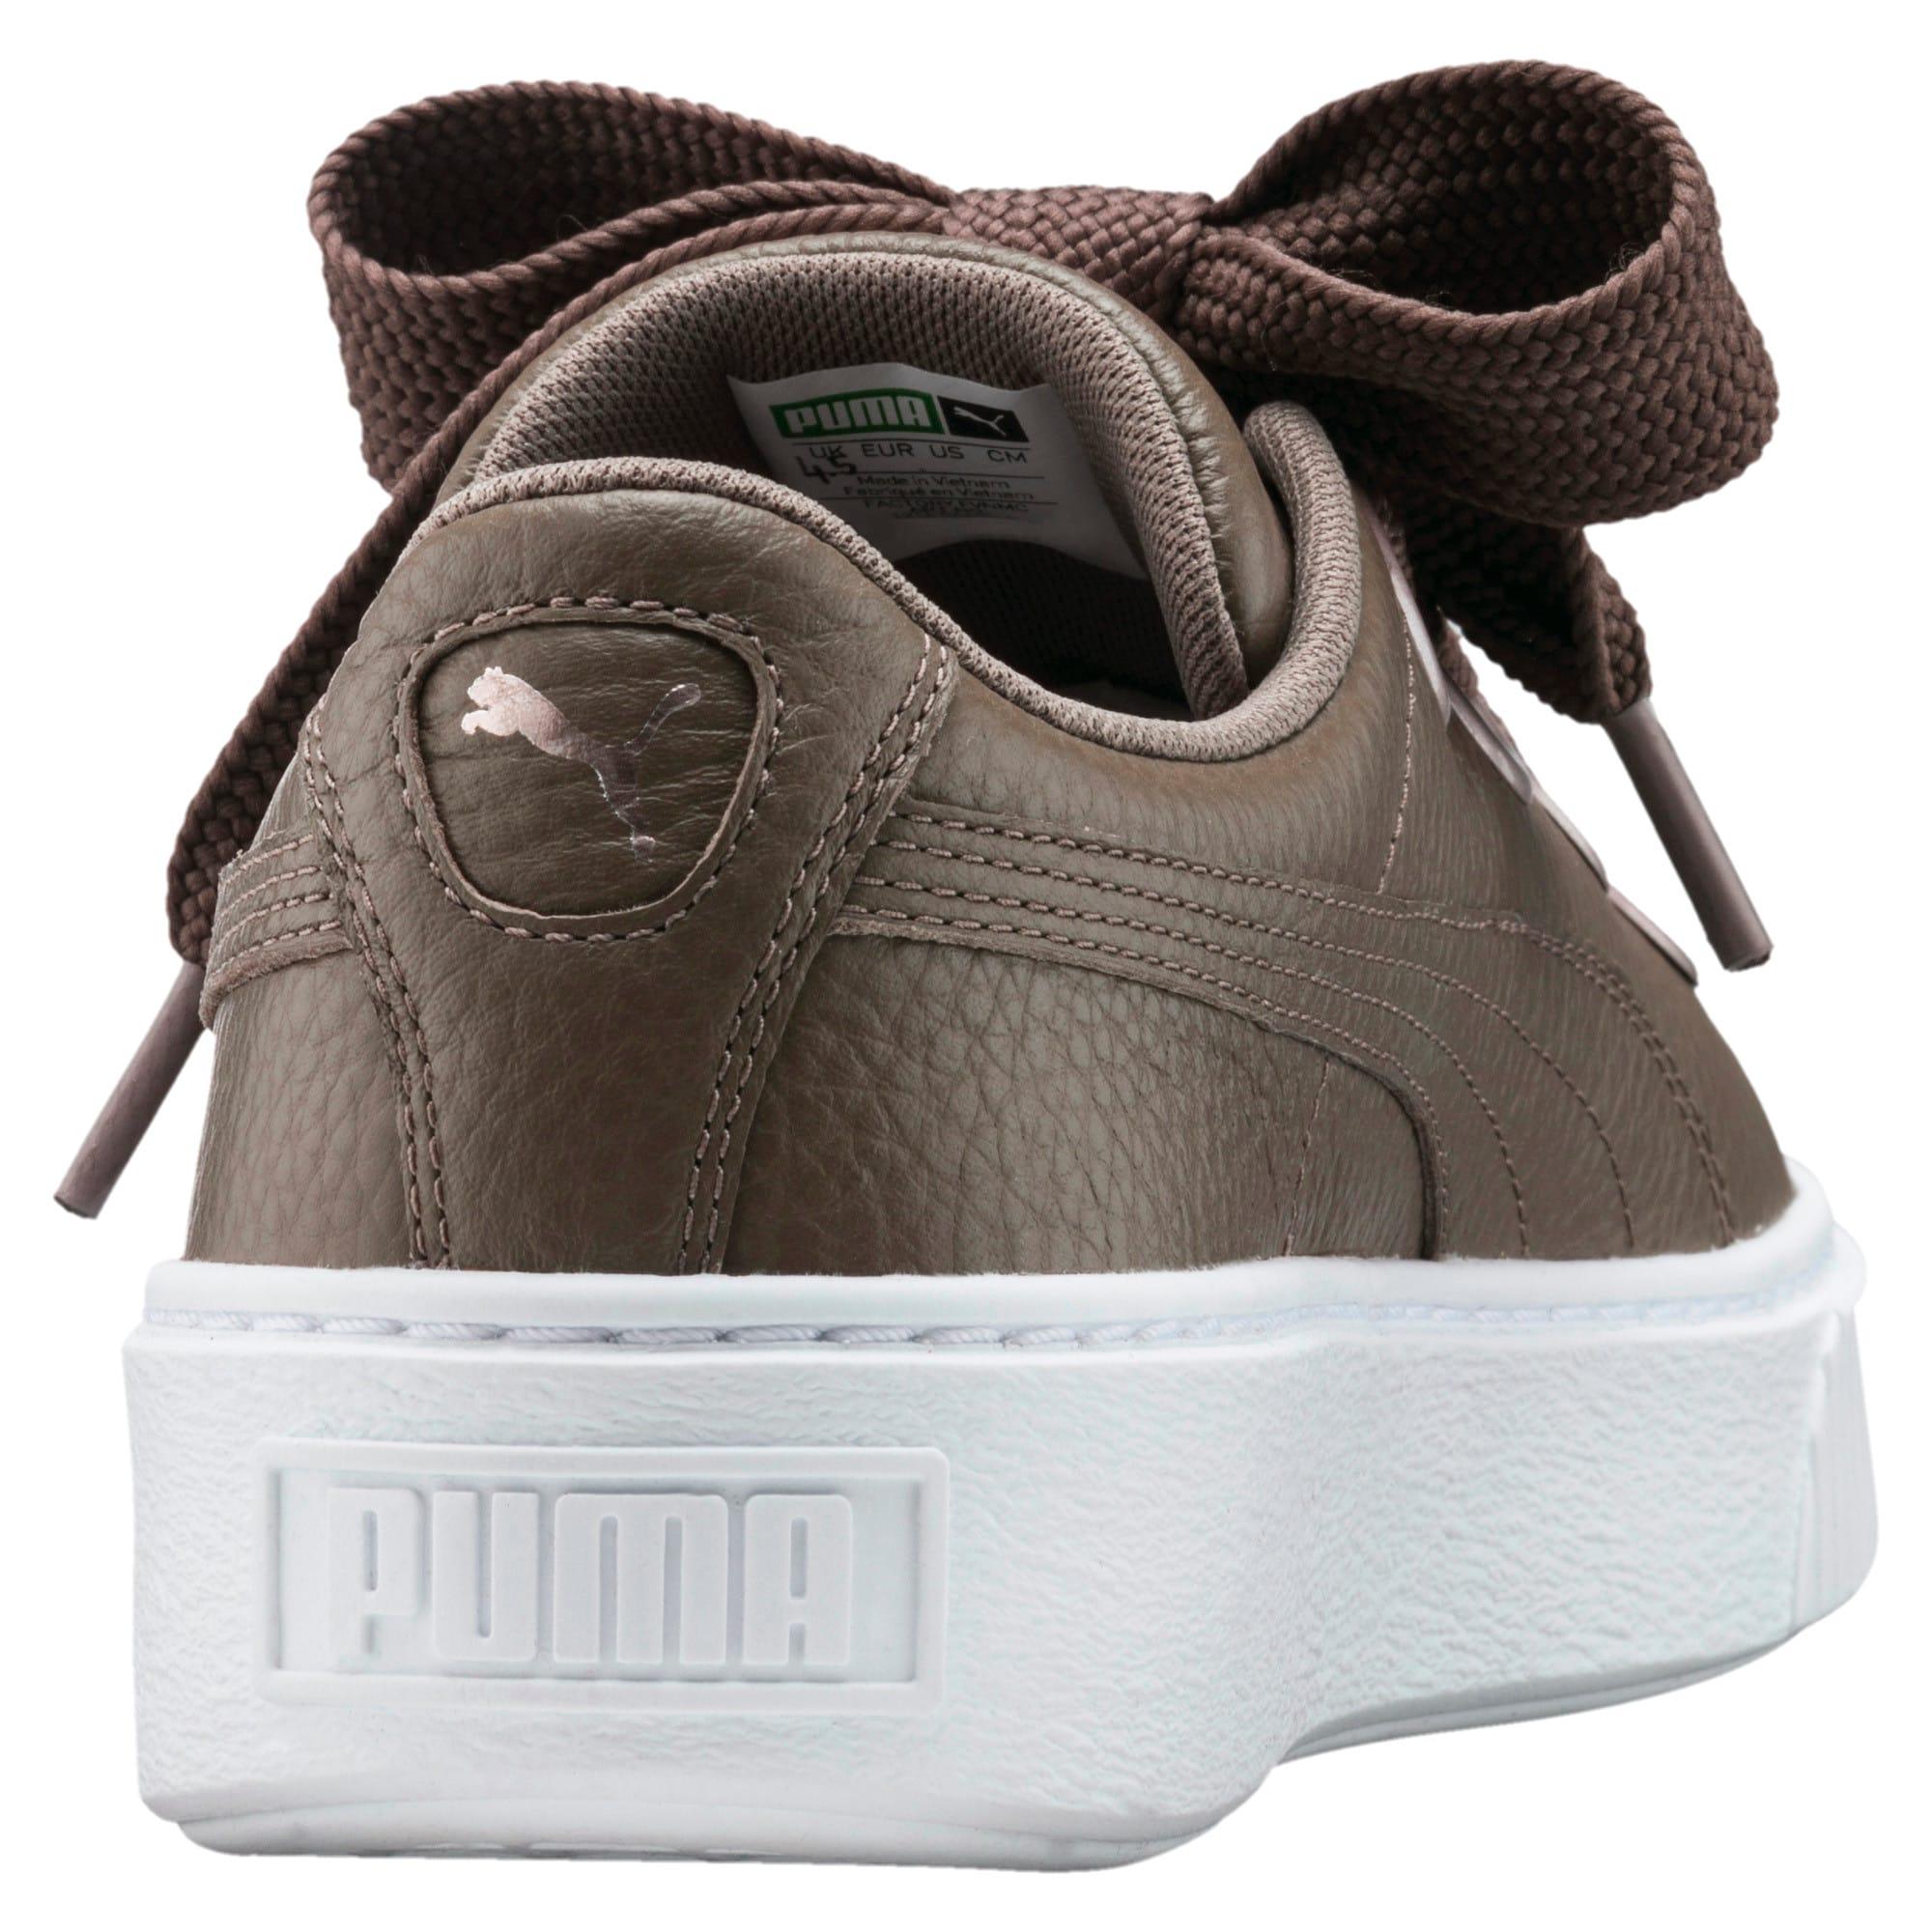 Thumbnail 4 of Platform Kiss Leather Women's Sneakers, Bungee Cord, medium